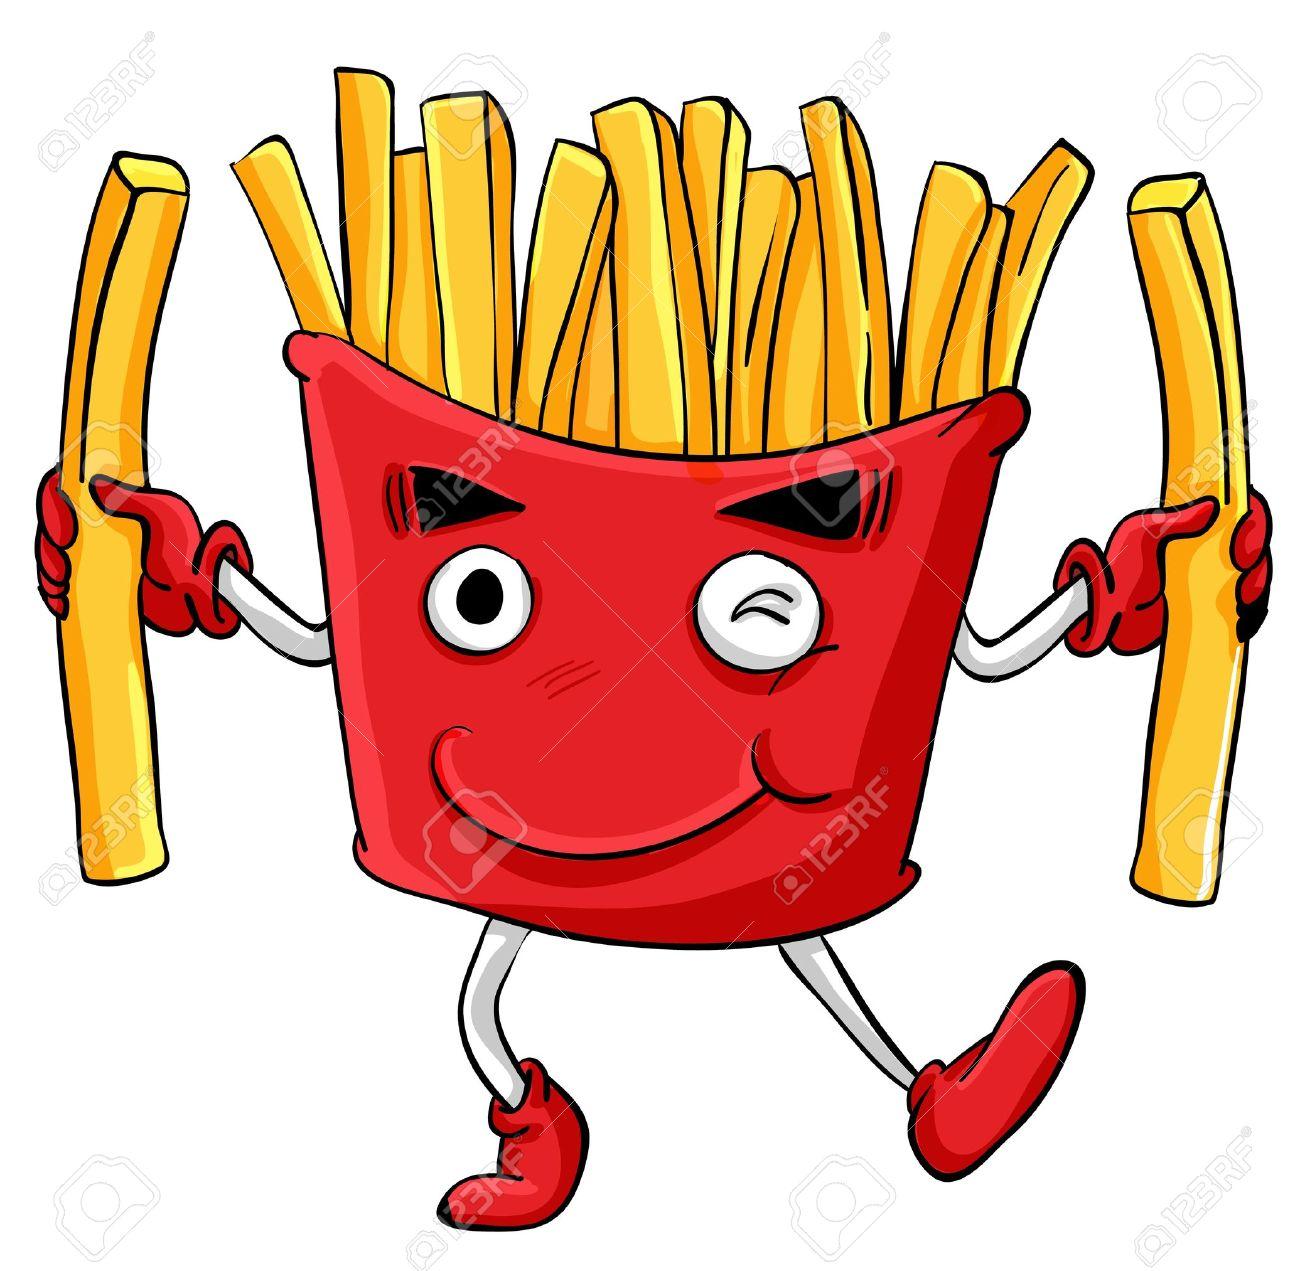 Illustration of comical cartoon food Stock Vector - 13935073